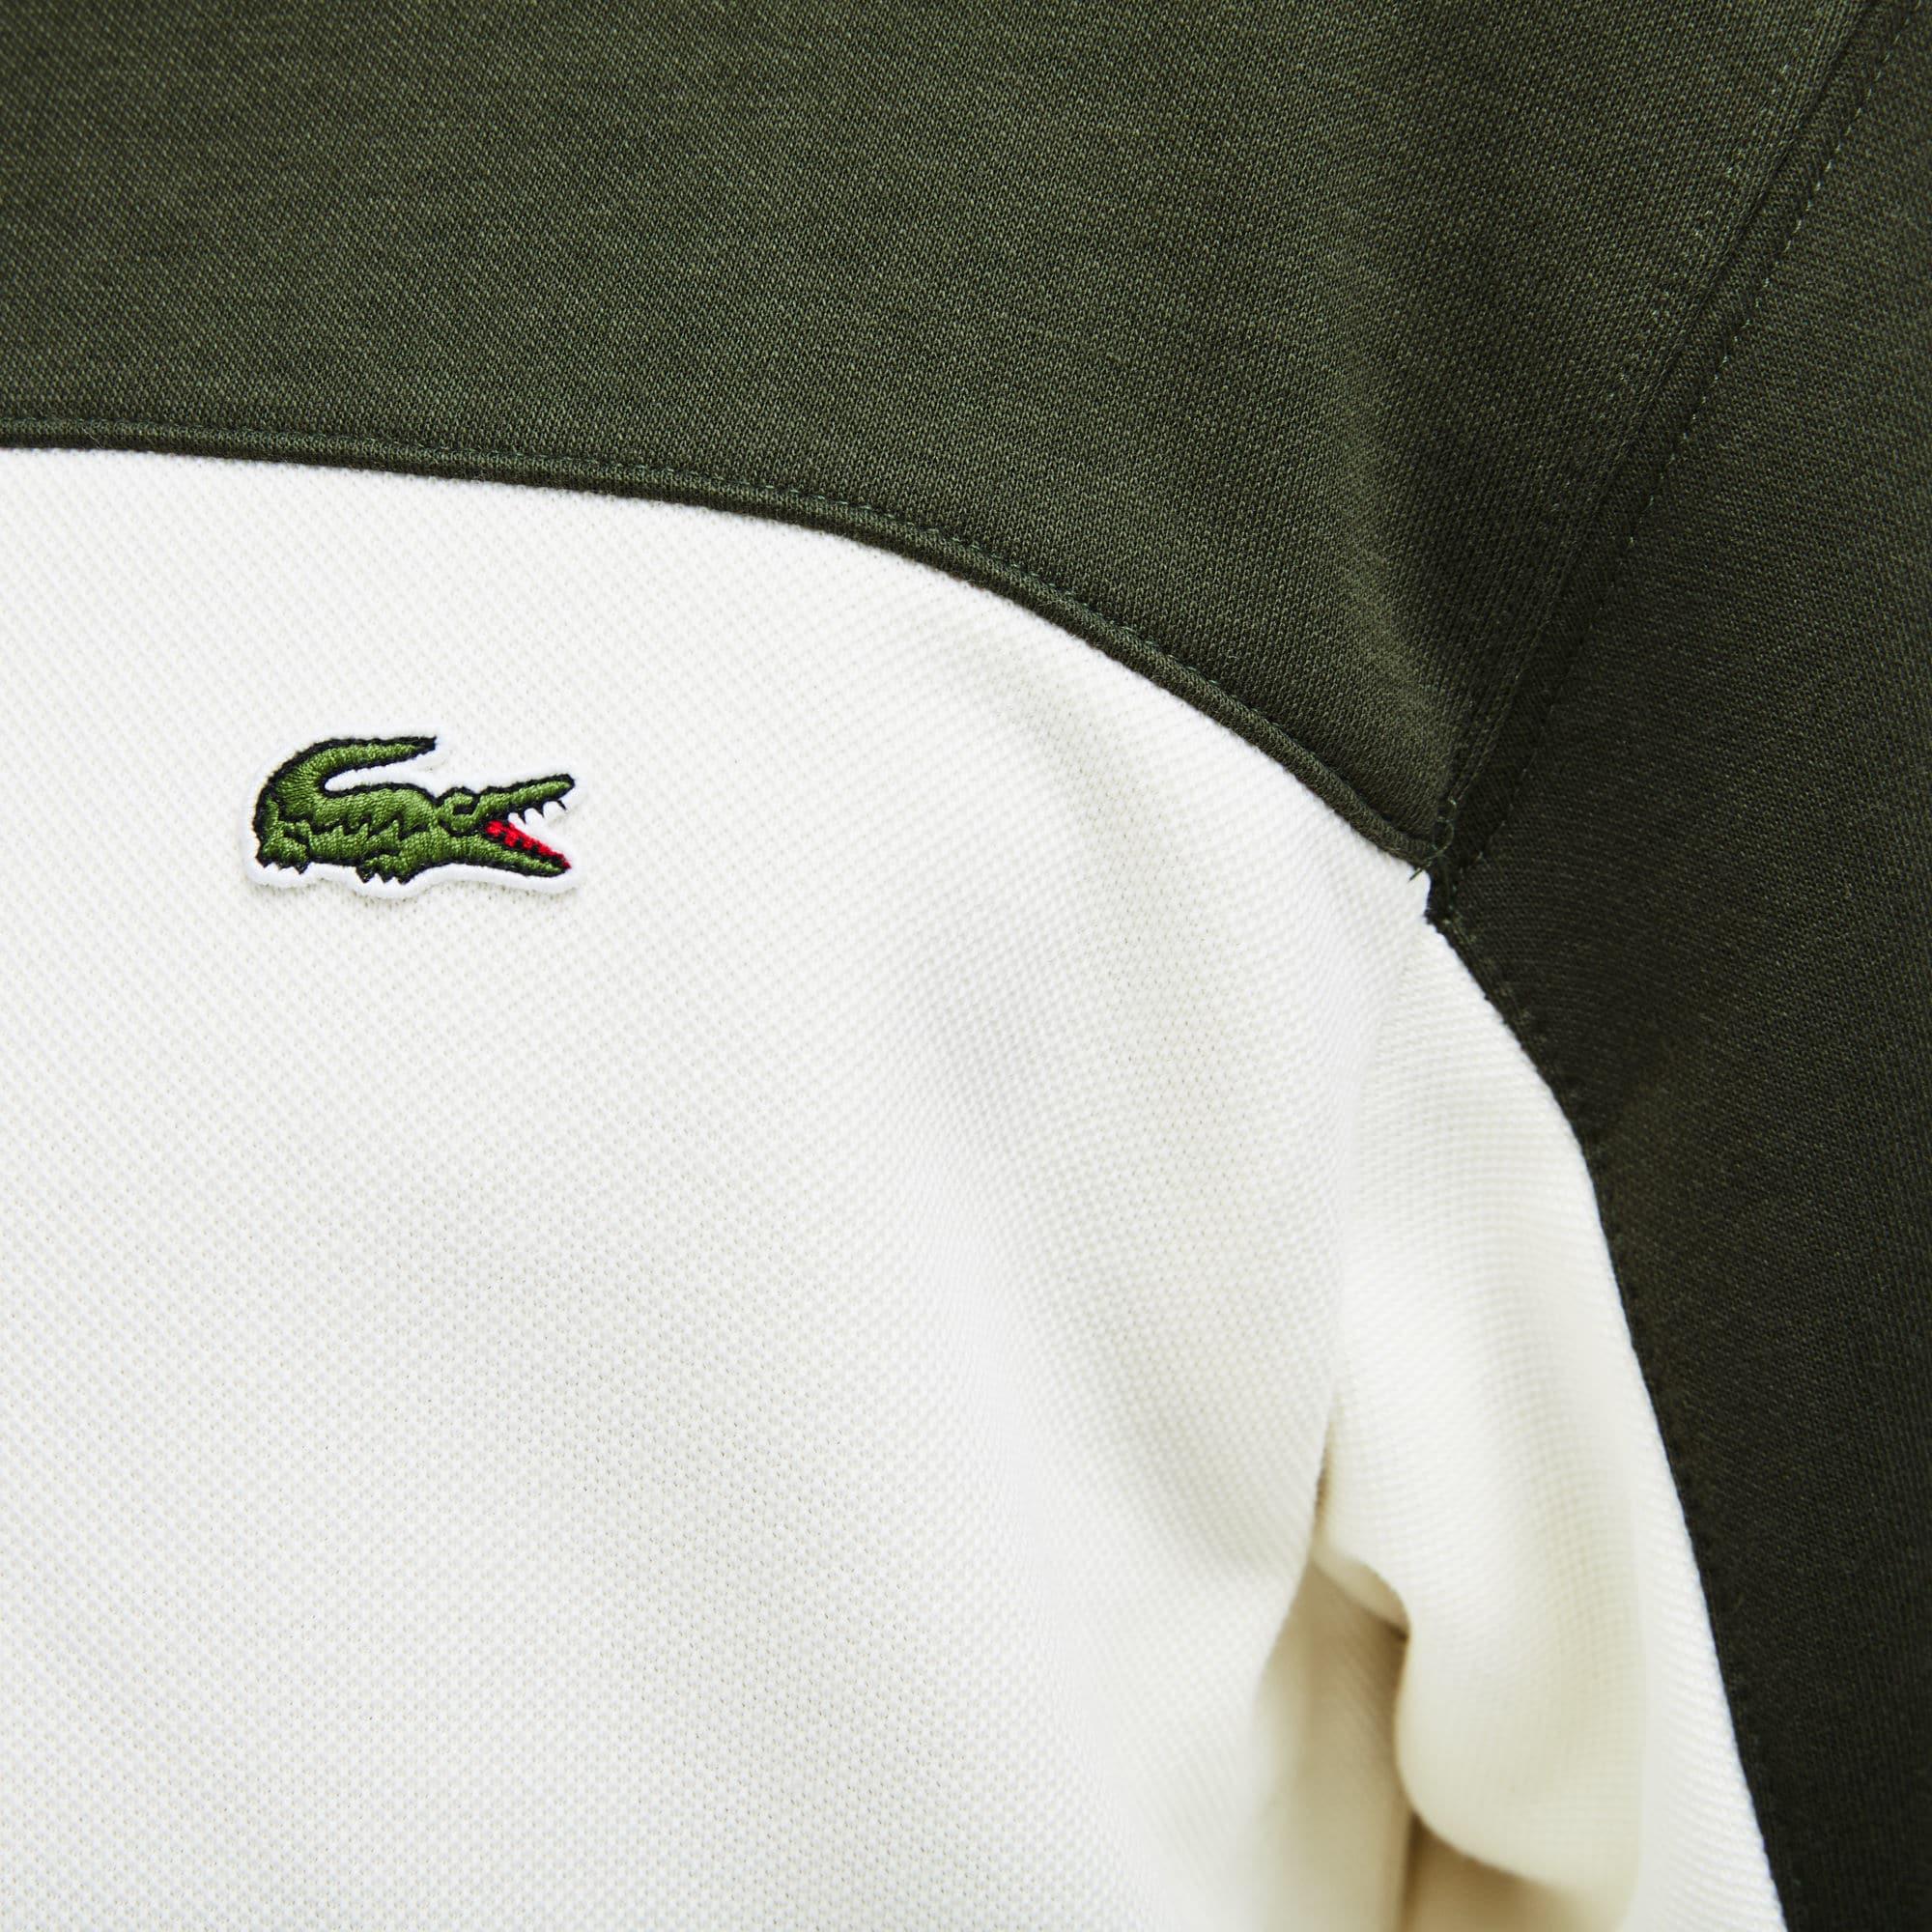 Фото 3 - Мужскую толстовку Lacoste зеленого цвета